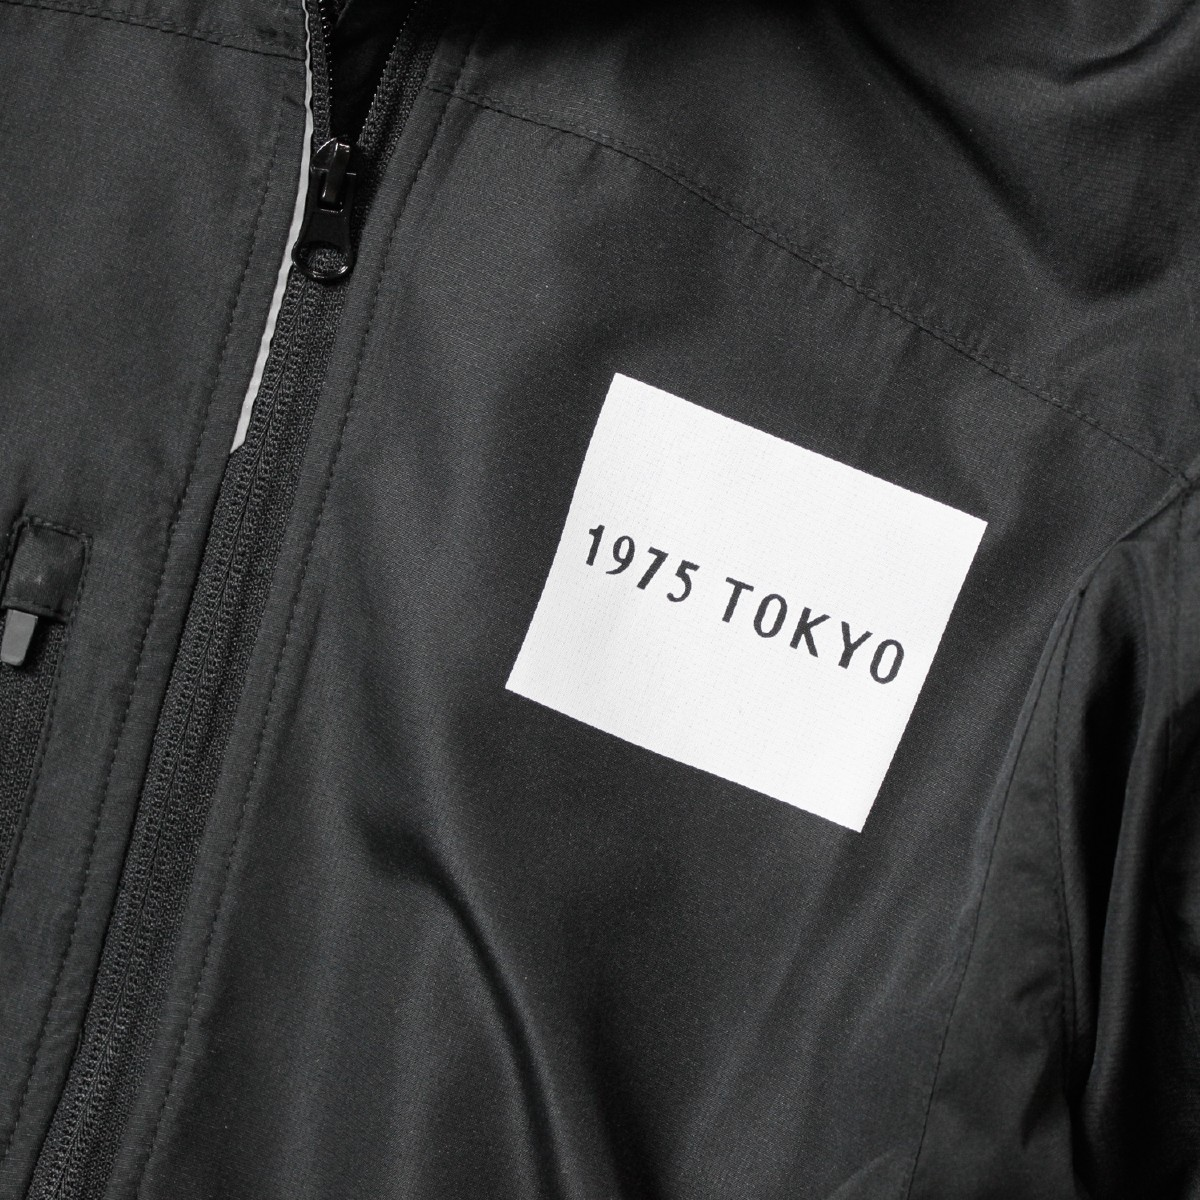 【30%OFF】1975 TOKYO 1975トーキョー SOFT SHELL